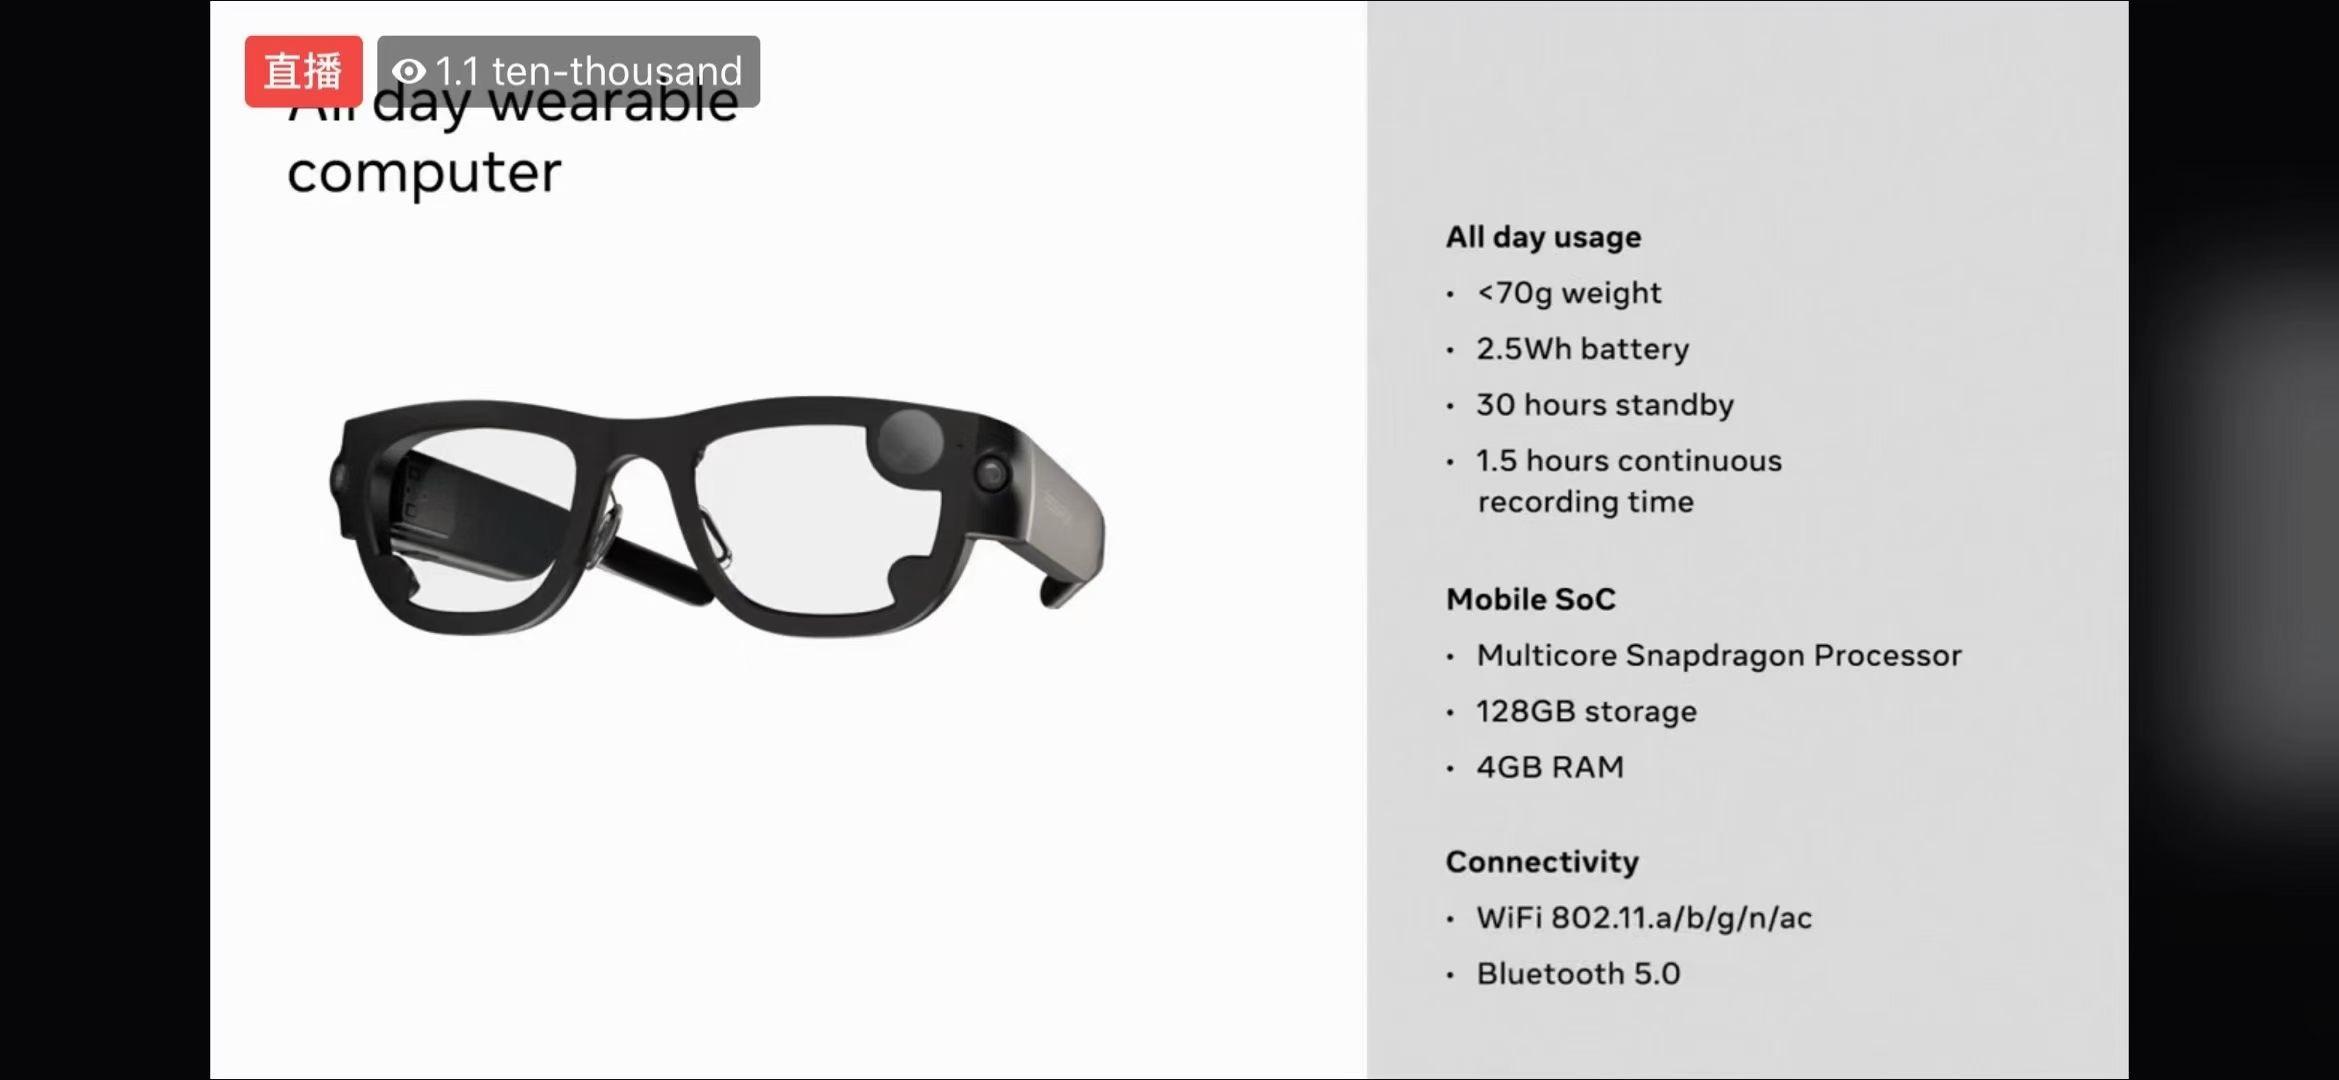 Facebook展示AR眼镜项目Aria,为消费级AR铺平道路【Facebook Connect】